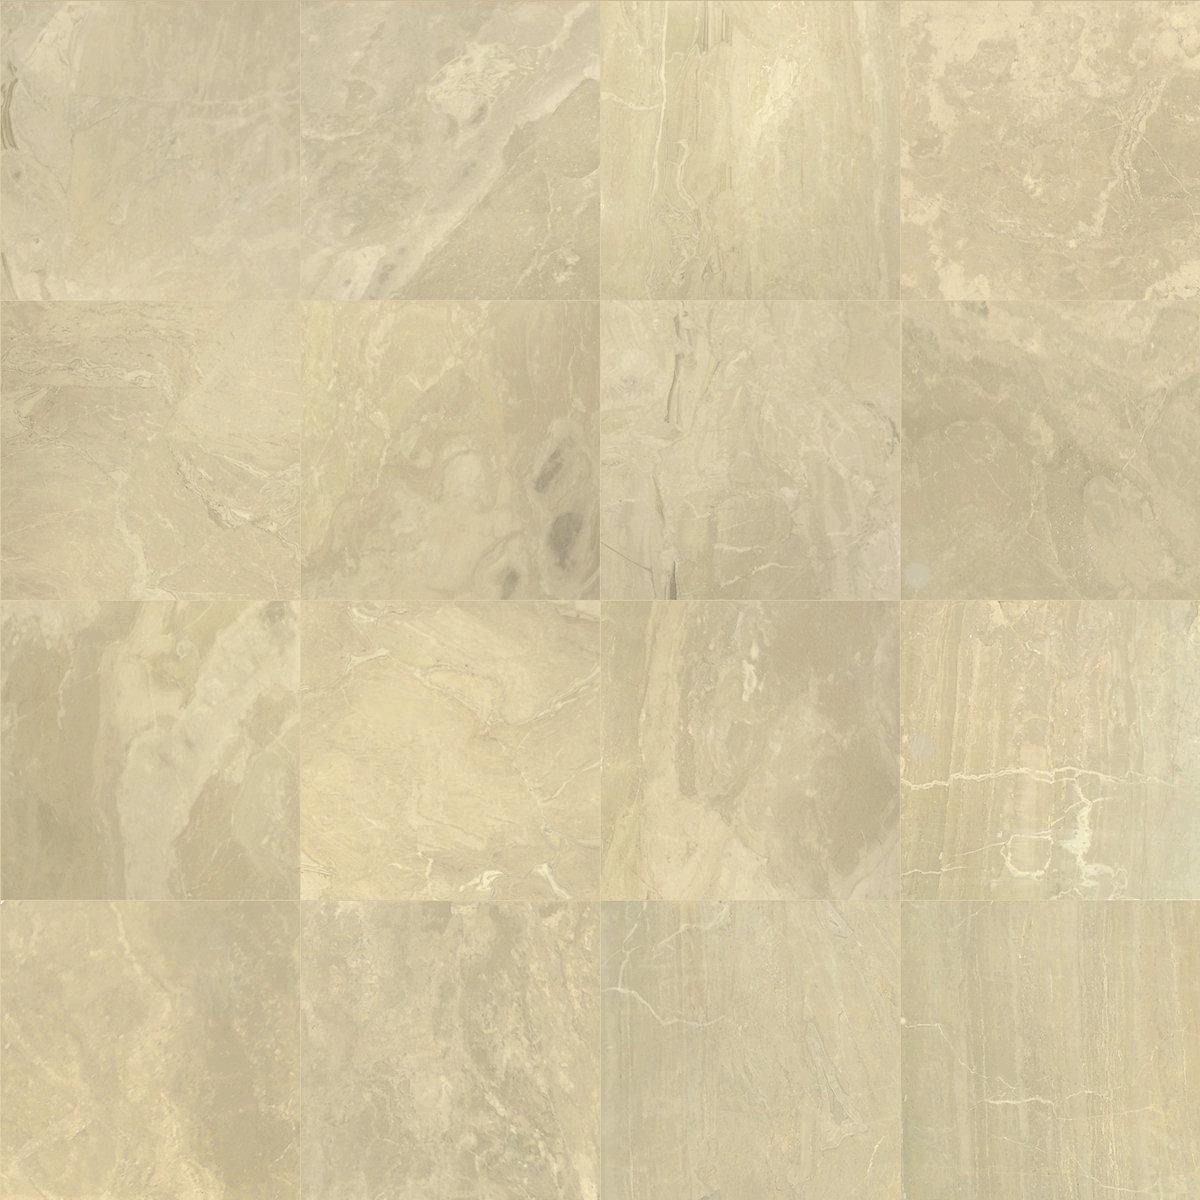 ... Cream Marble Texture